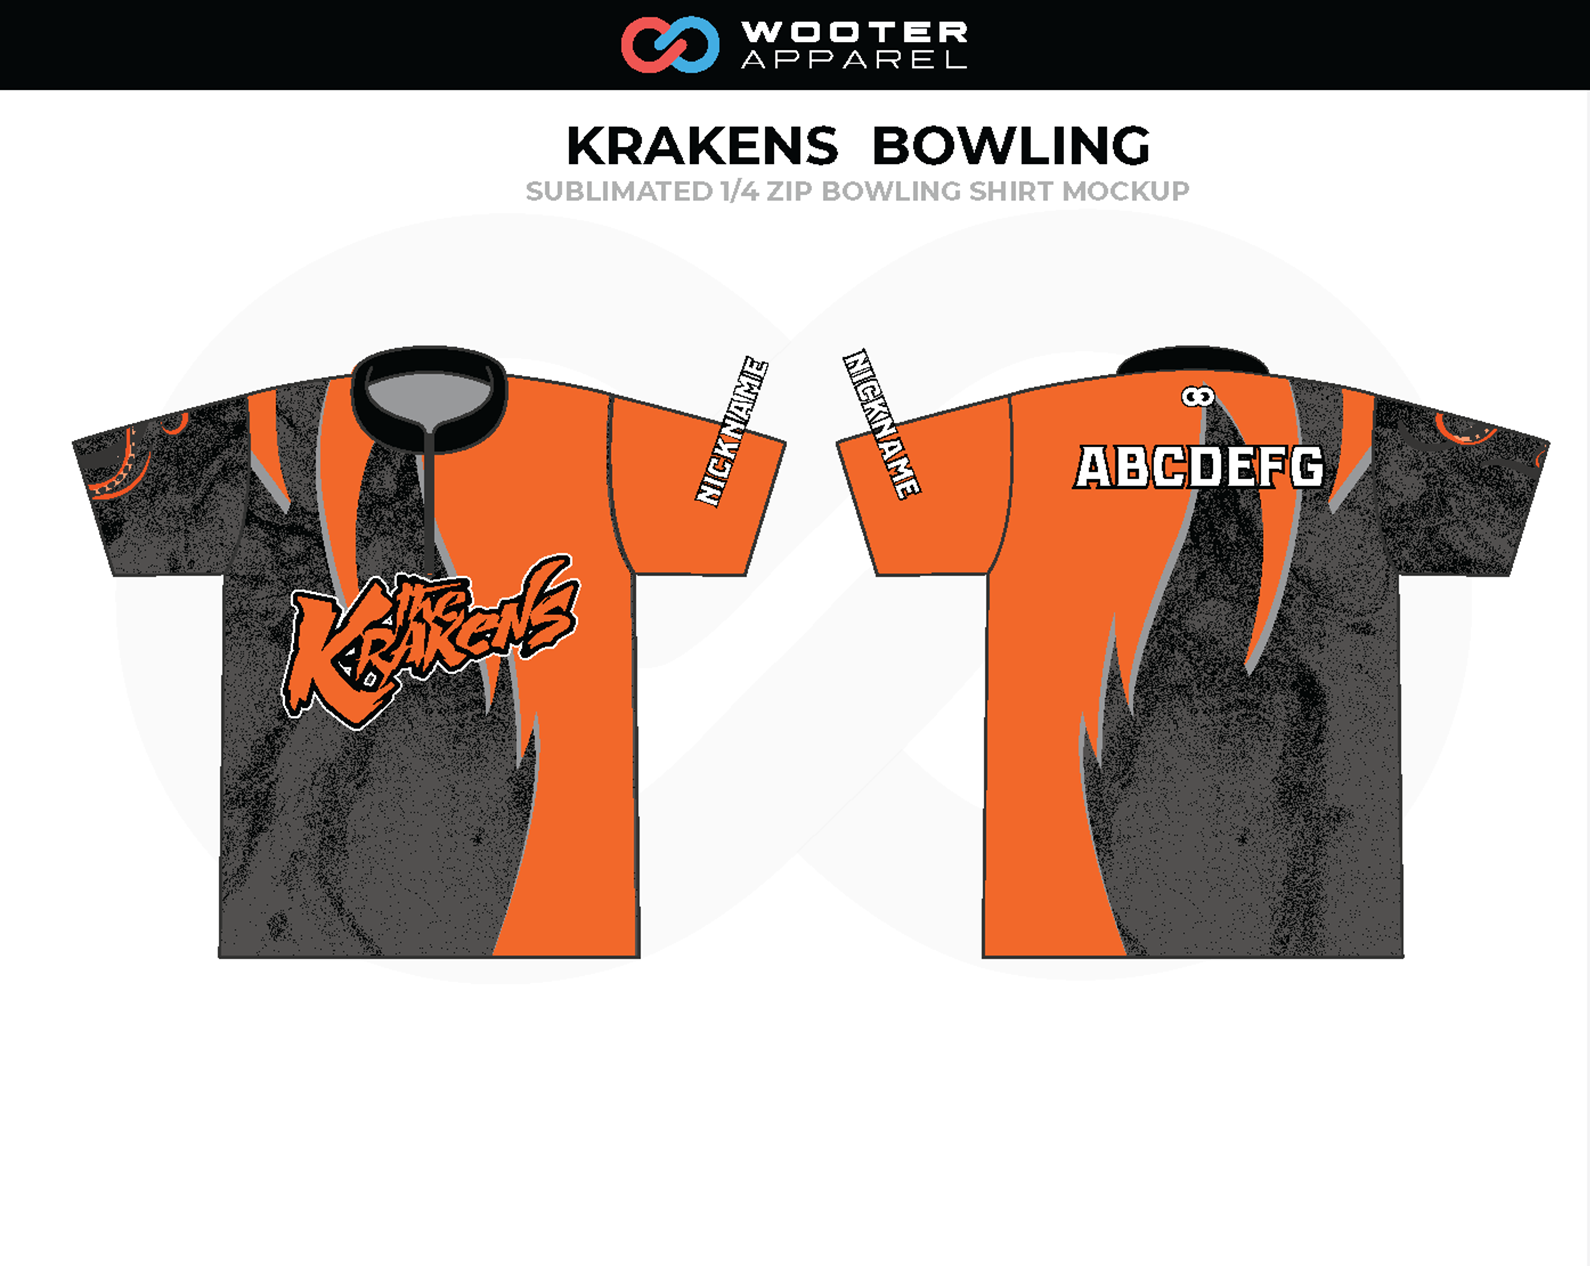 KrakensBowling_MockupV2.png